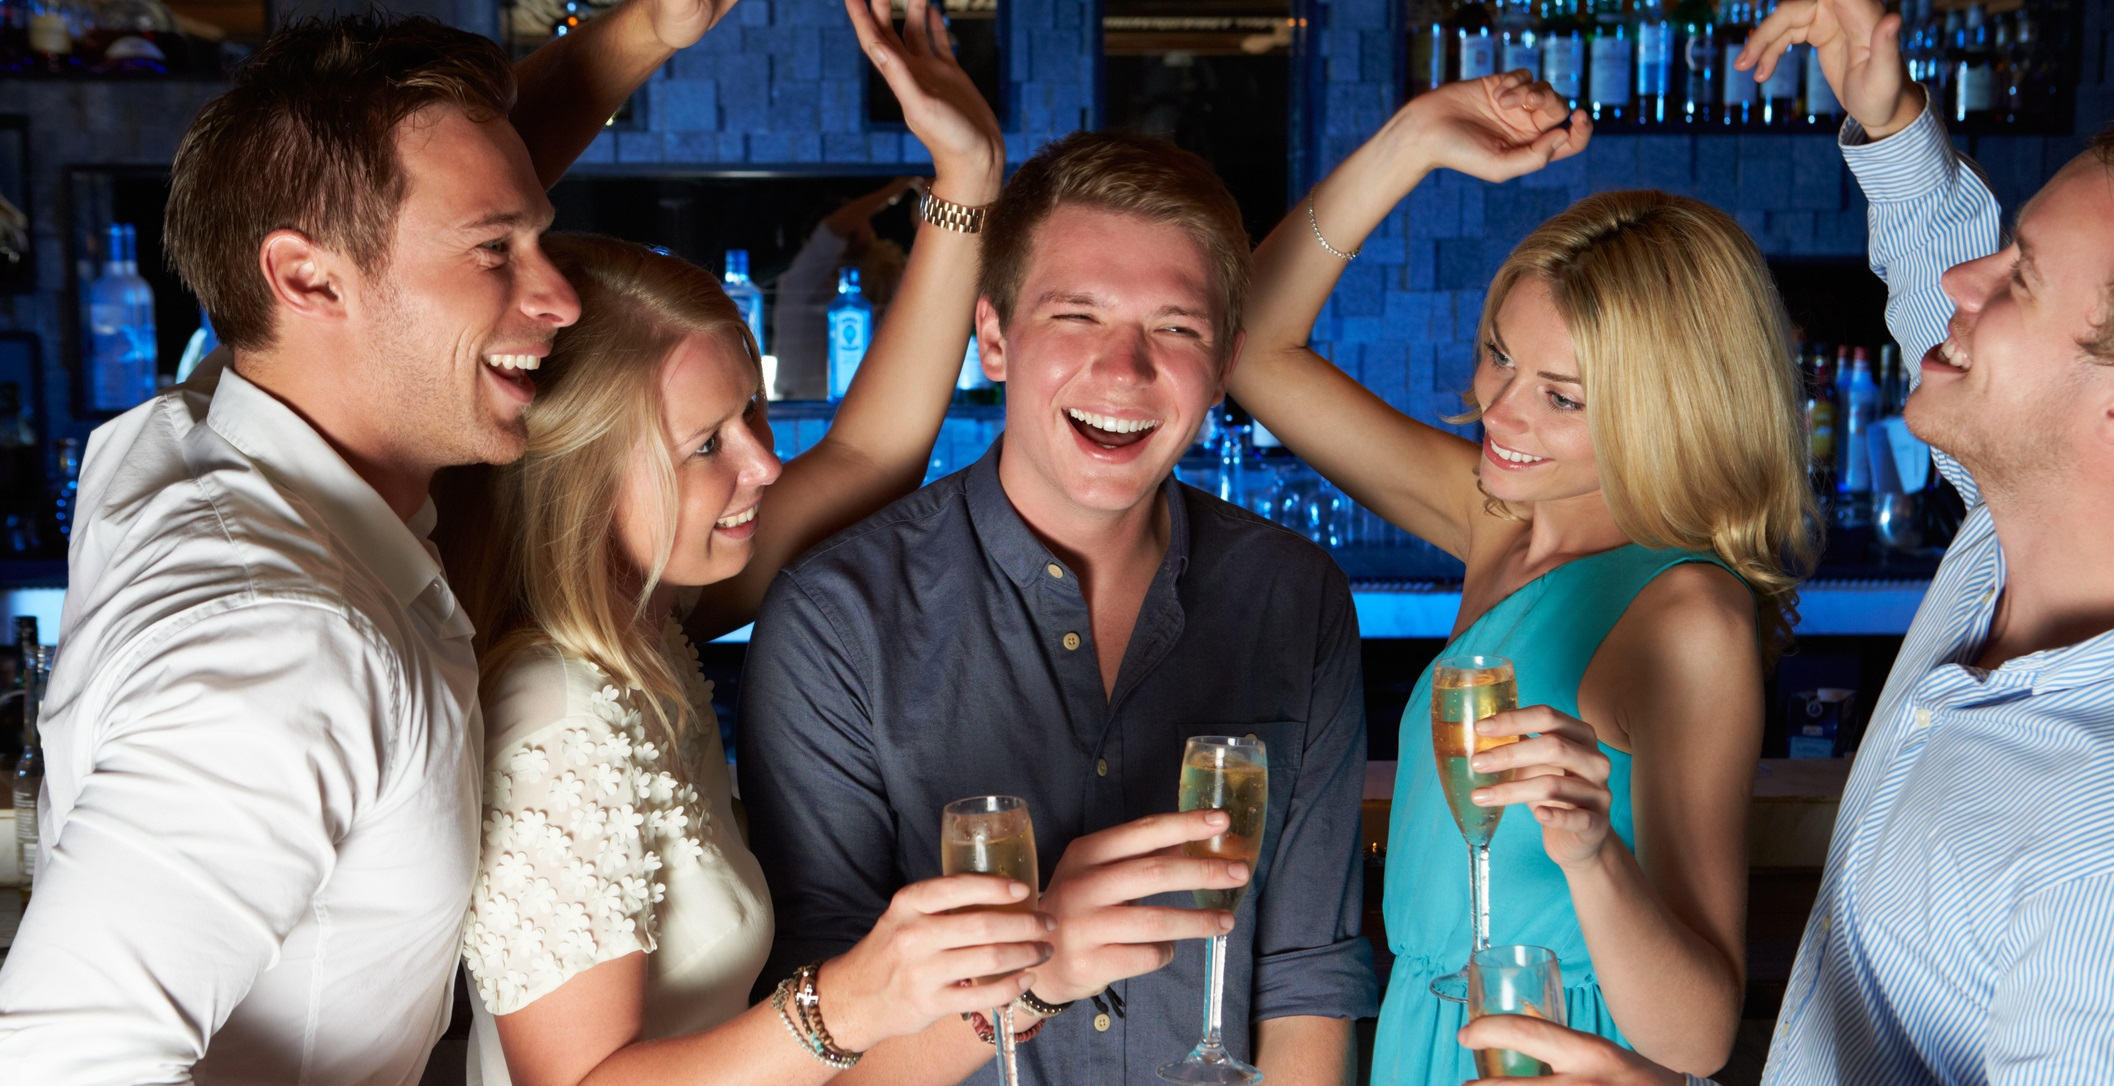 Should dancers avoid alcohol